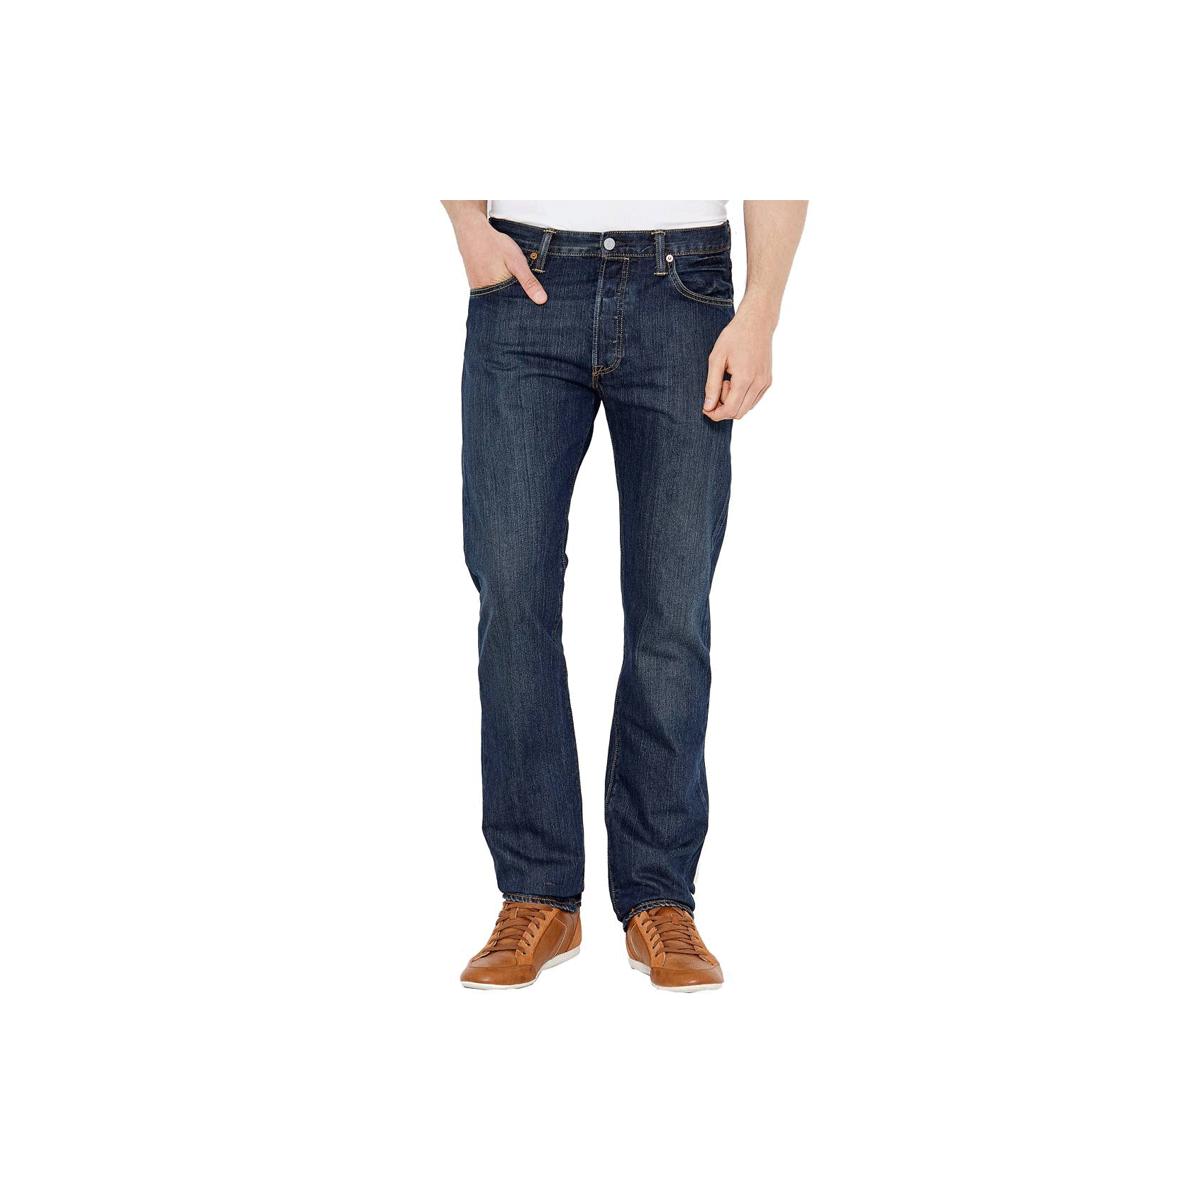 00501 501 Regular 00501 Regular Jeans Droite Levi's 00501 Regular vdx8Sqn